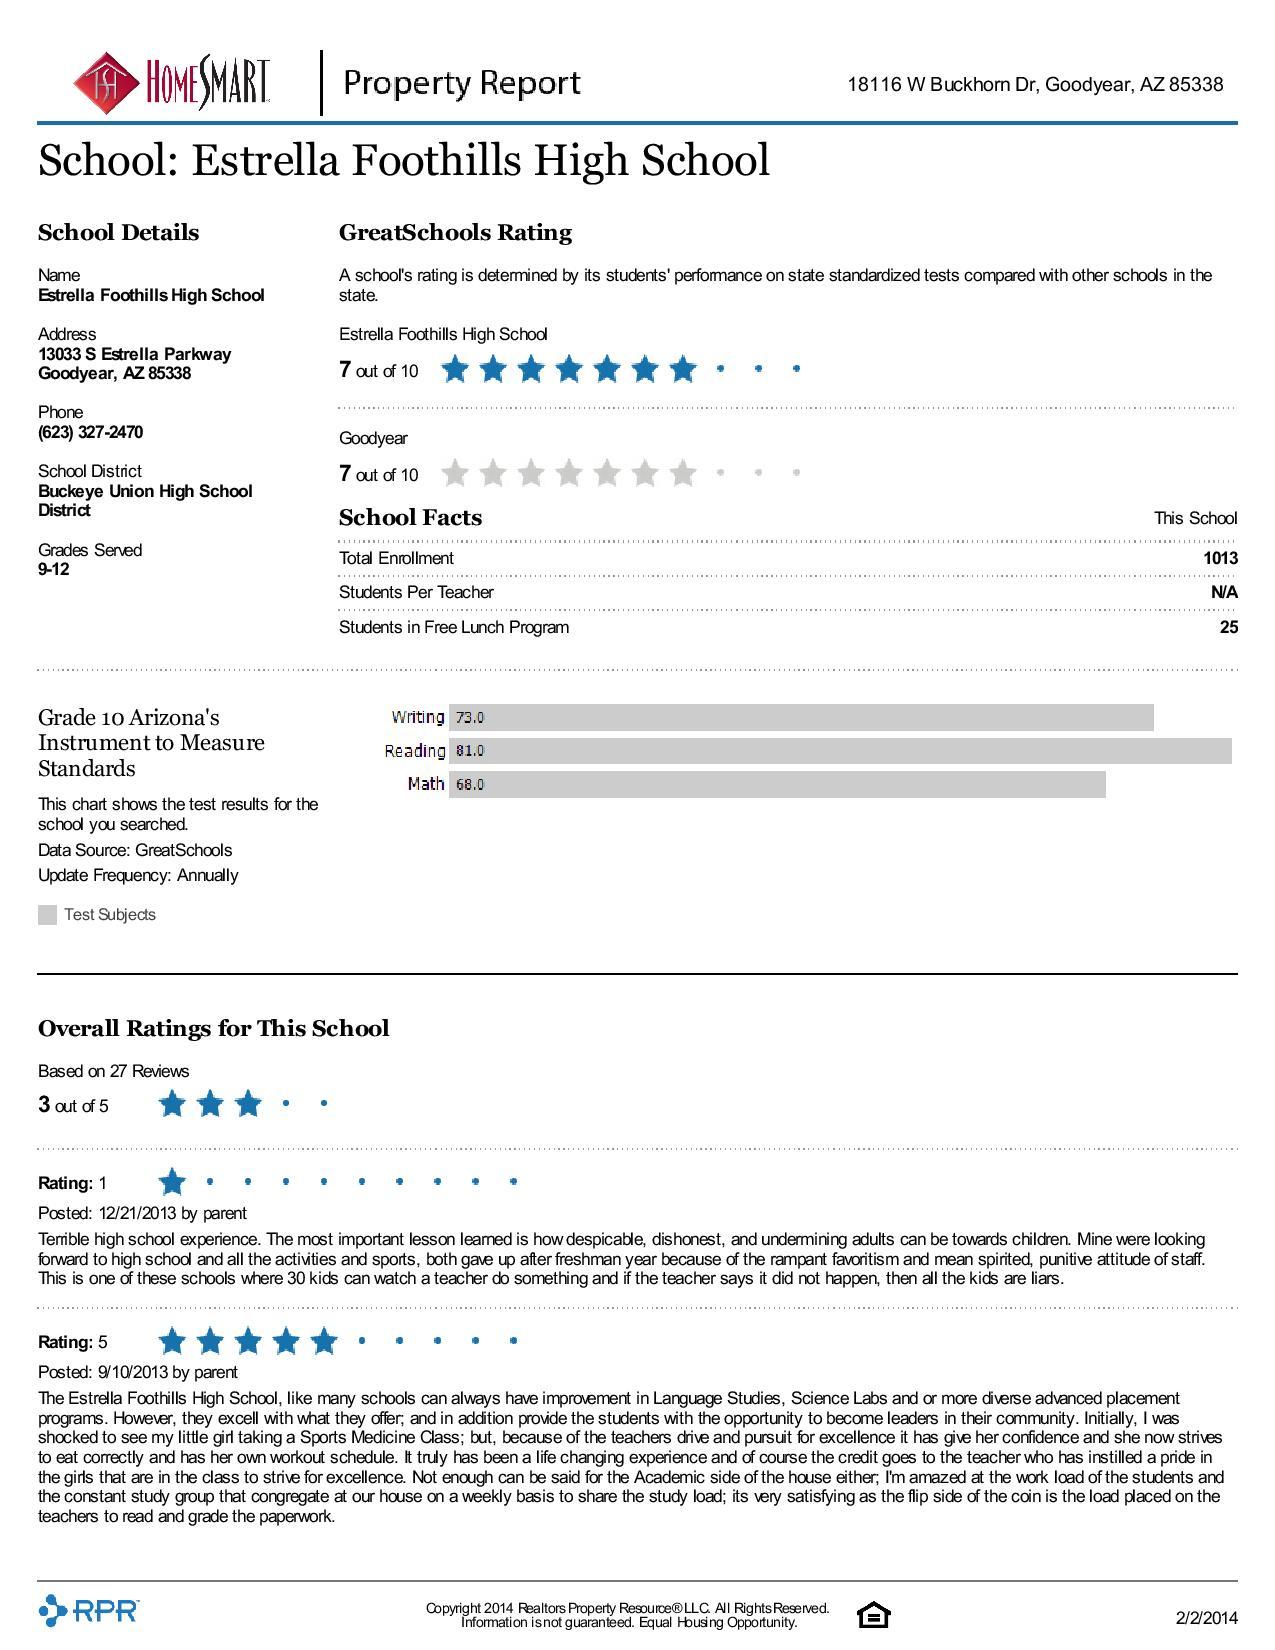 18116-W-Buckhorn-Dr-Goodyear-AZ-85338.pdf-page-010